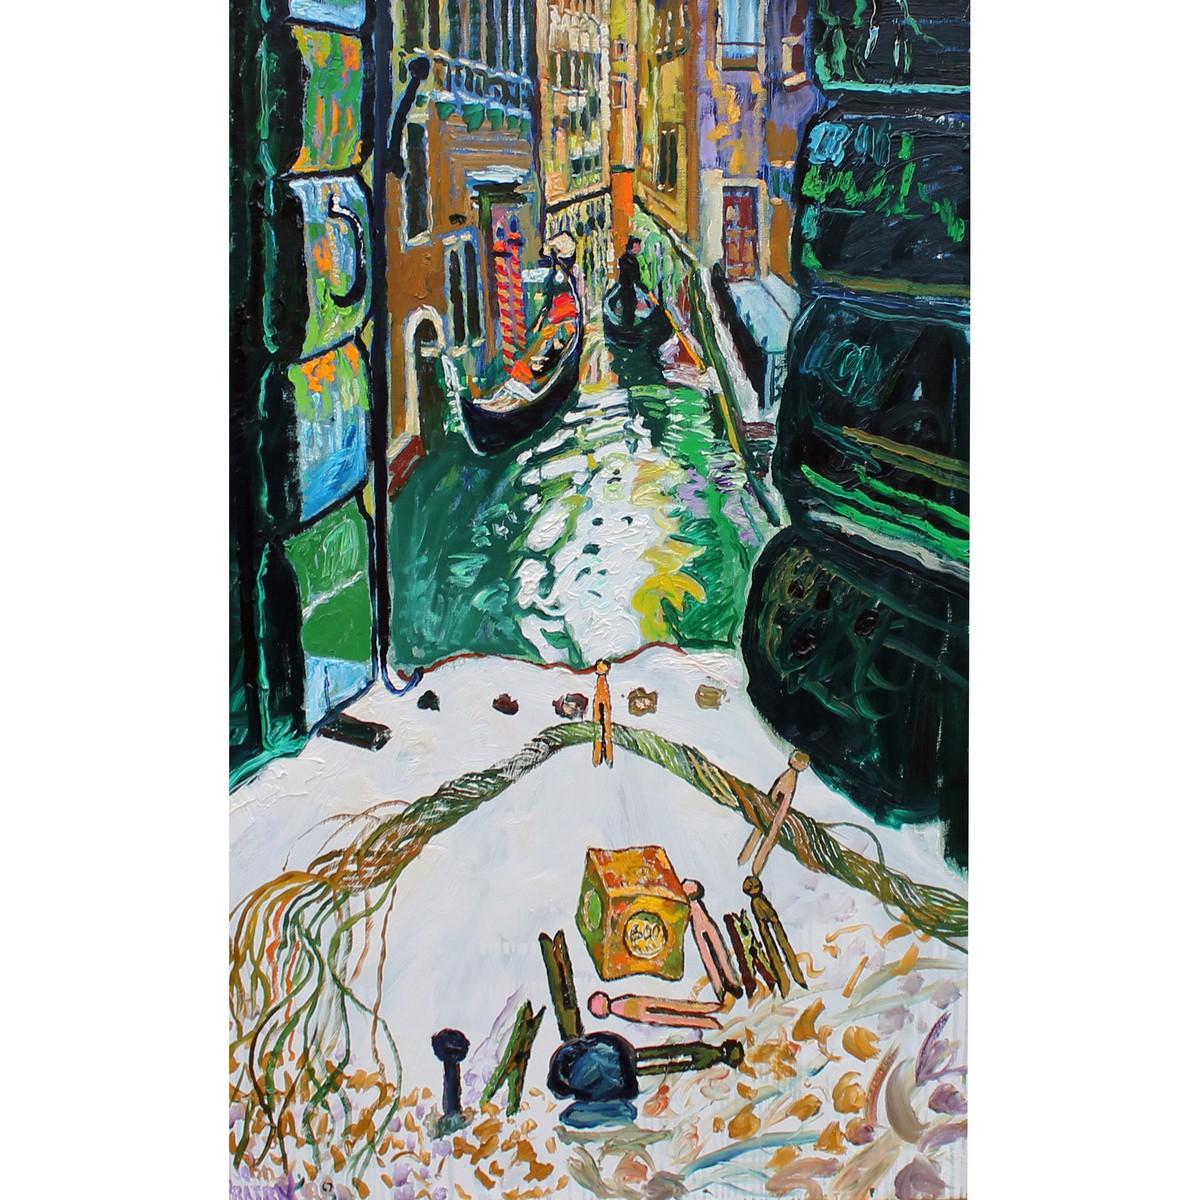 Lot 9 - Bratby, John Randall, 1922-1992 British AR, Venice, View through the Window